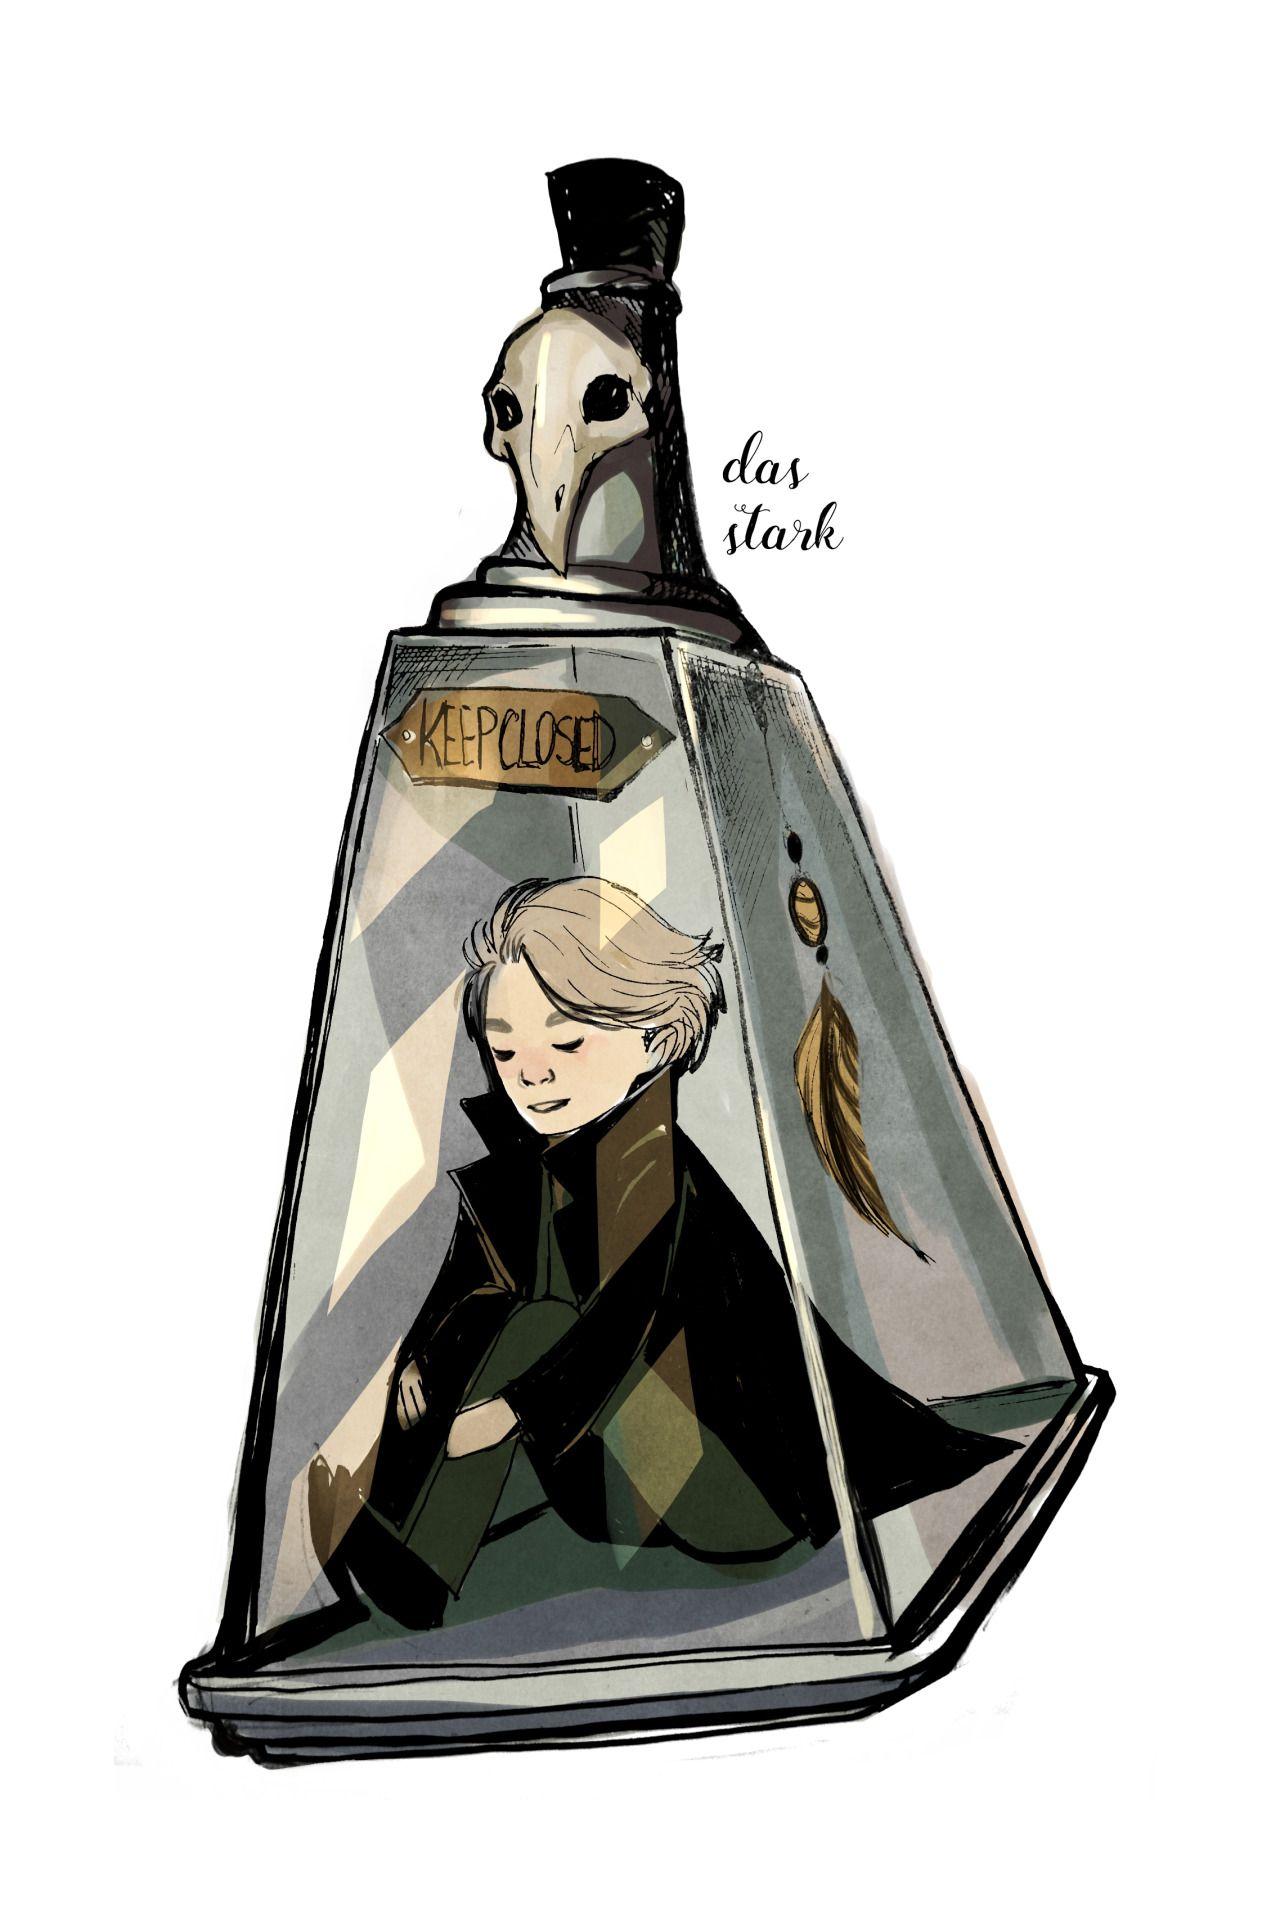 Harry Potter fanart: Draco Malfoy by dasstark.tumblr.com